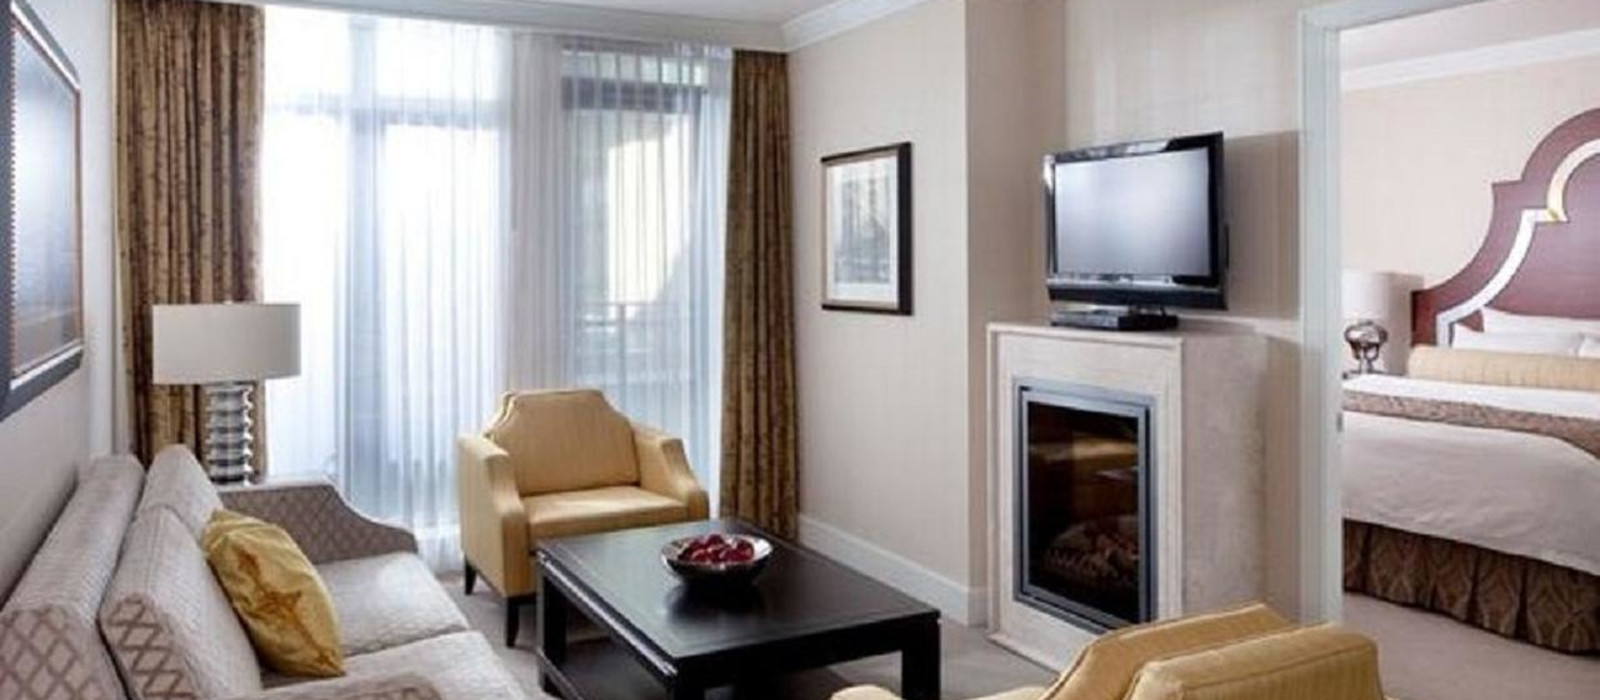 Hotel L'Hermitage  Kanada